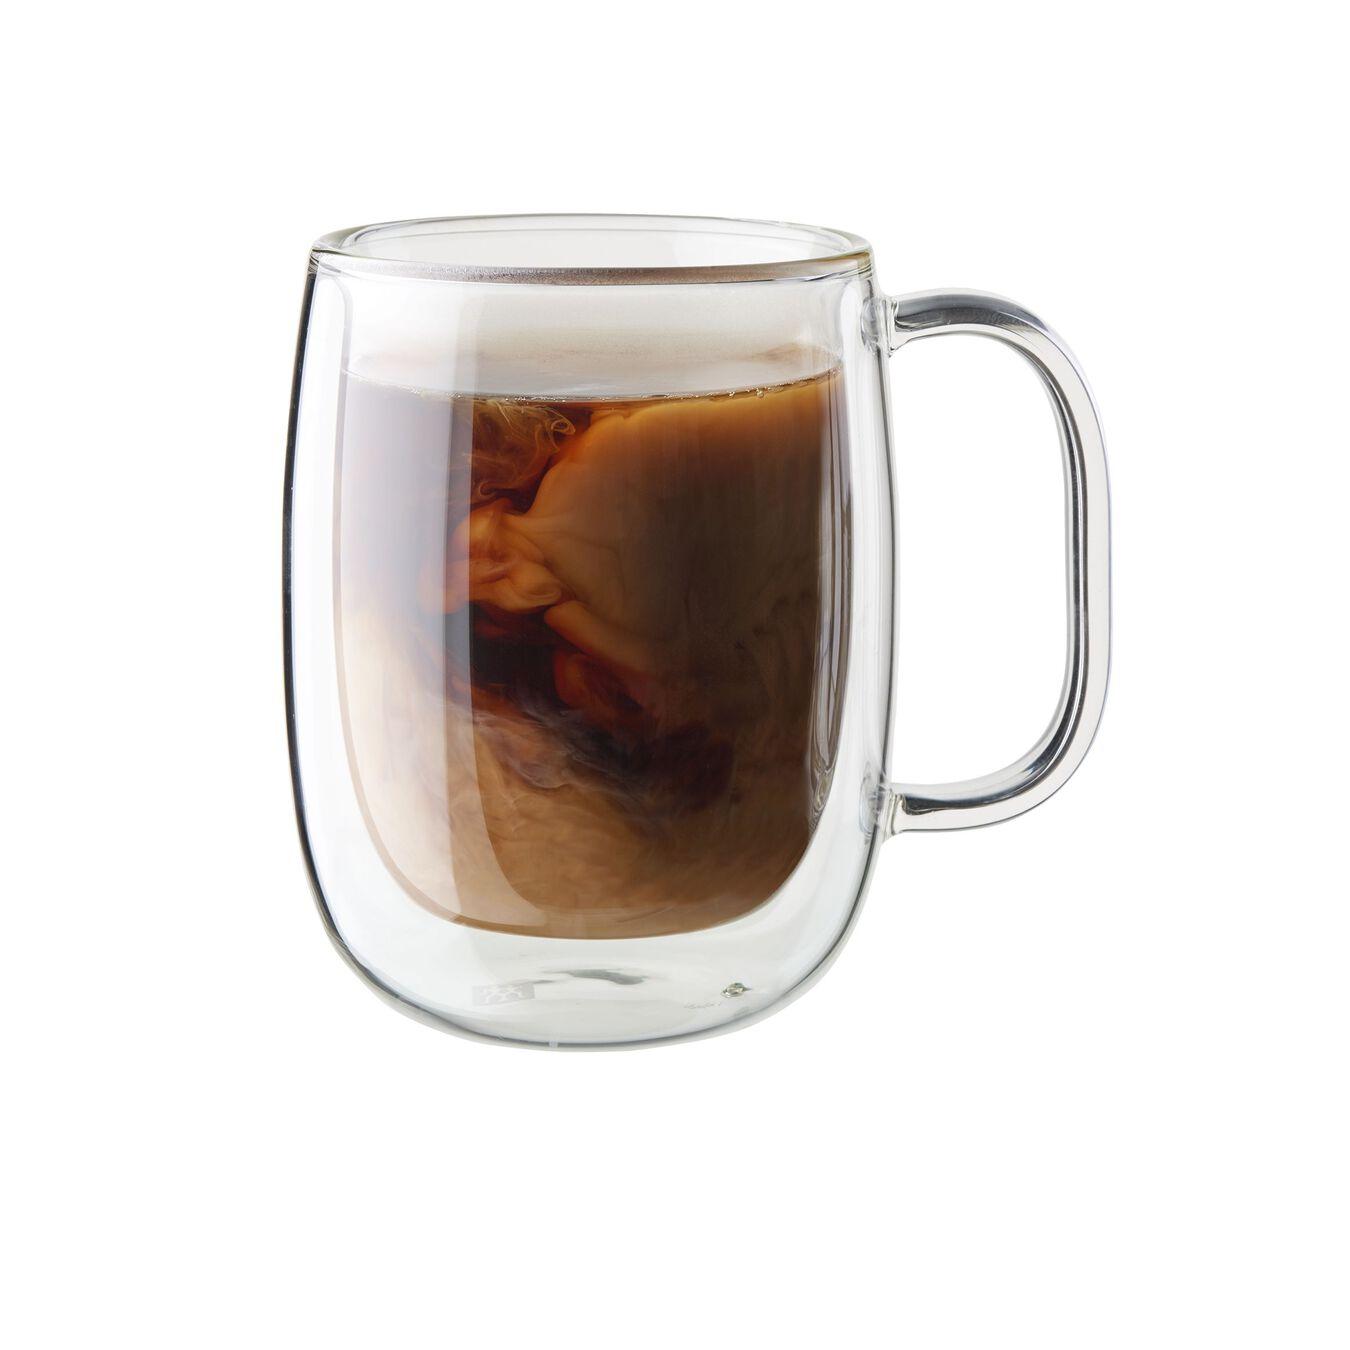 2-pc Double-Wall Glass Coffee Mug Set,,large 1